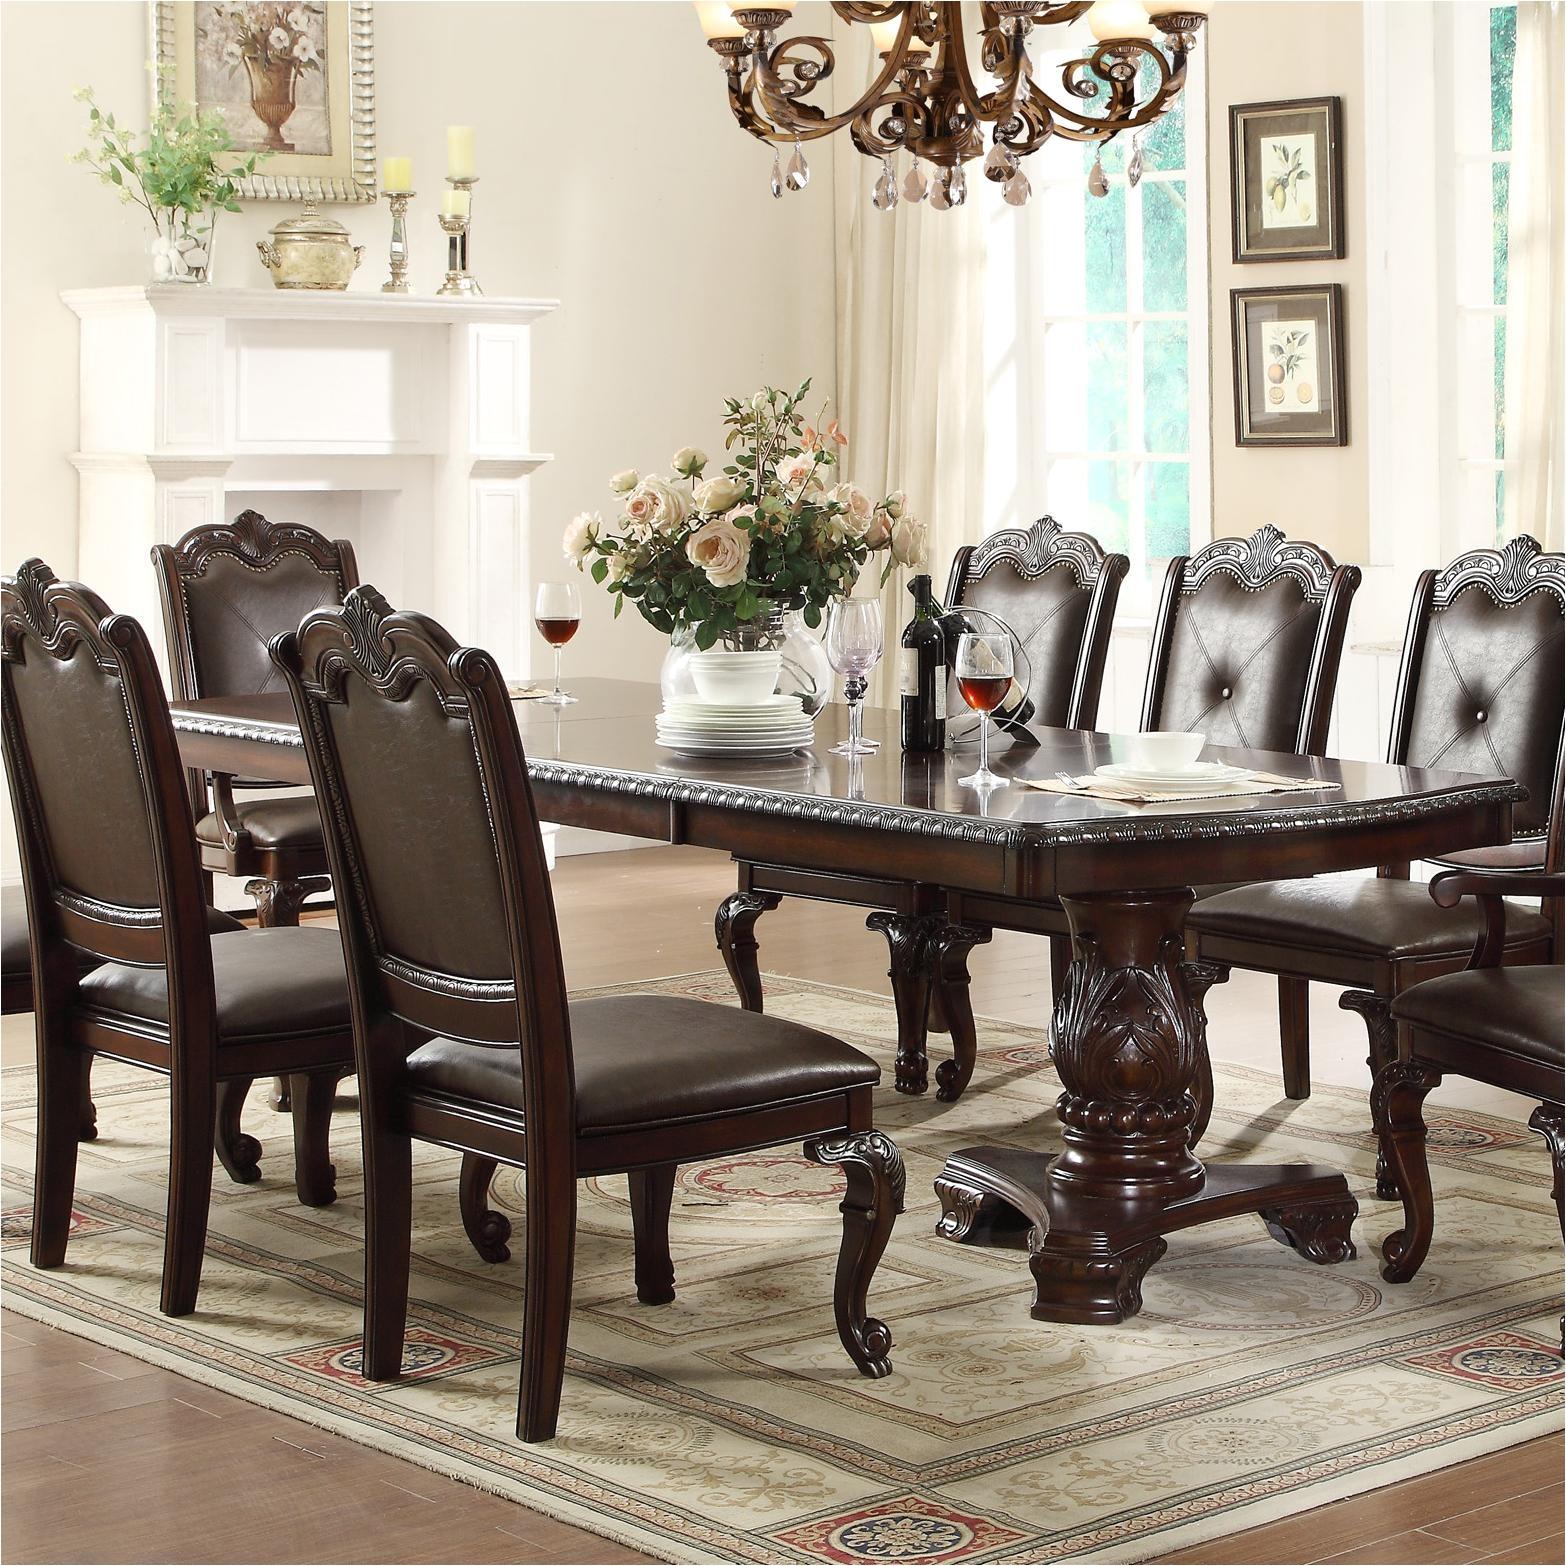 crown mark kiera dining table item number 2150t 44108 legtop